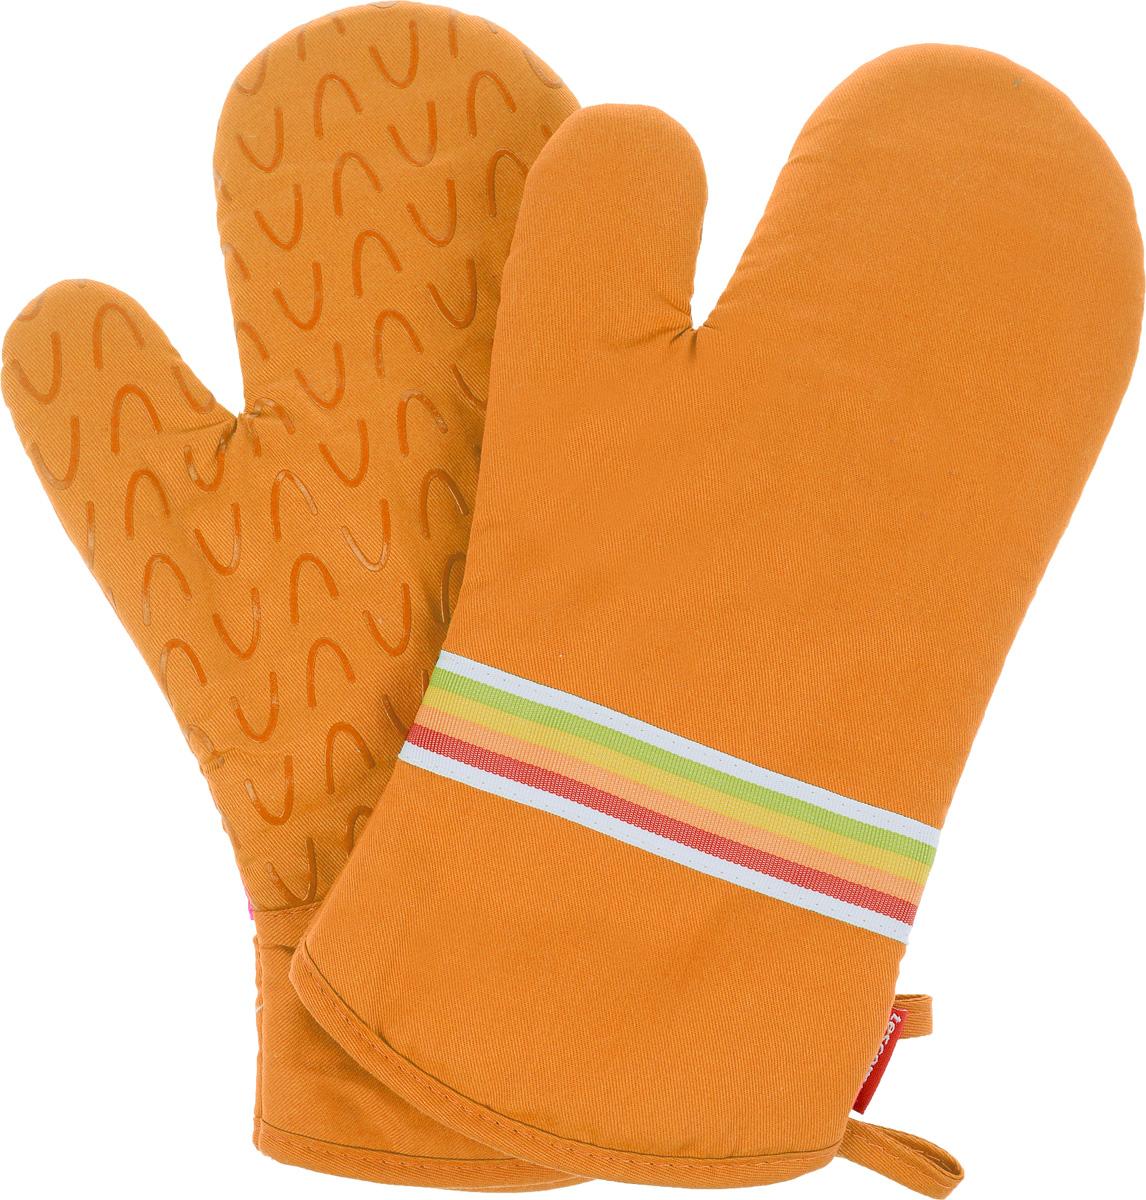 Рукавица-прихватка Tescoma Presto Tone, цвет: оранжевый, 33 х 18 см, 2 шт сито tescoma presto цвет светло зеленый диаметр 14 см